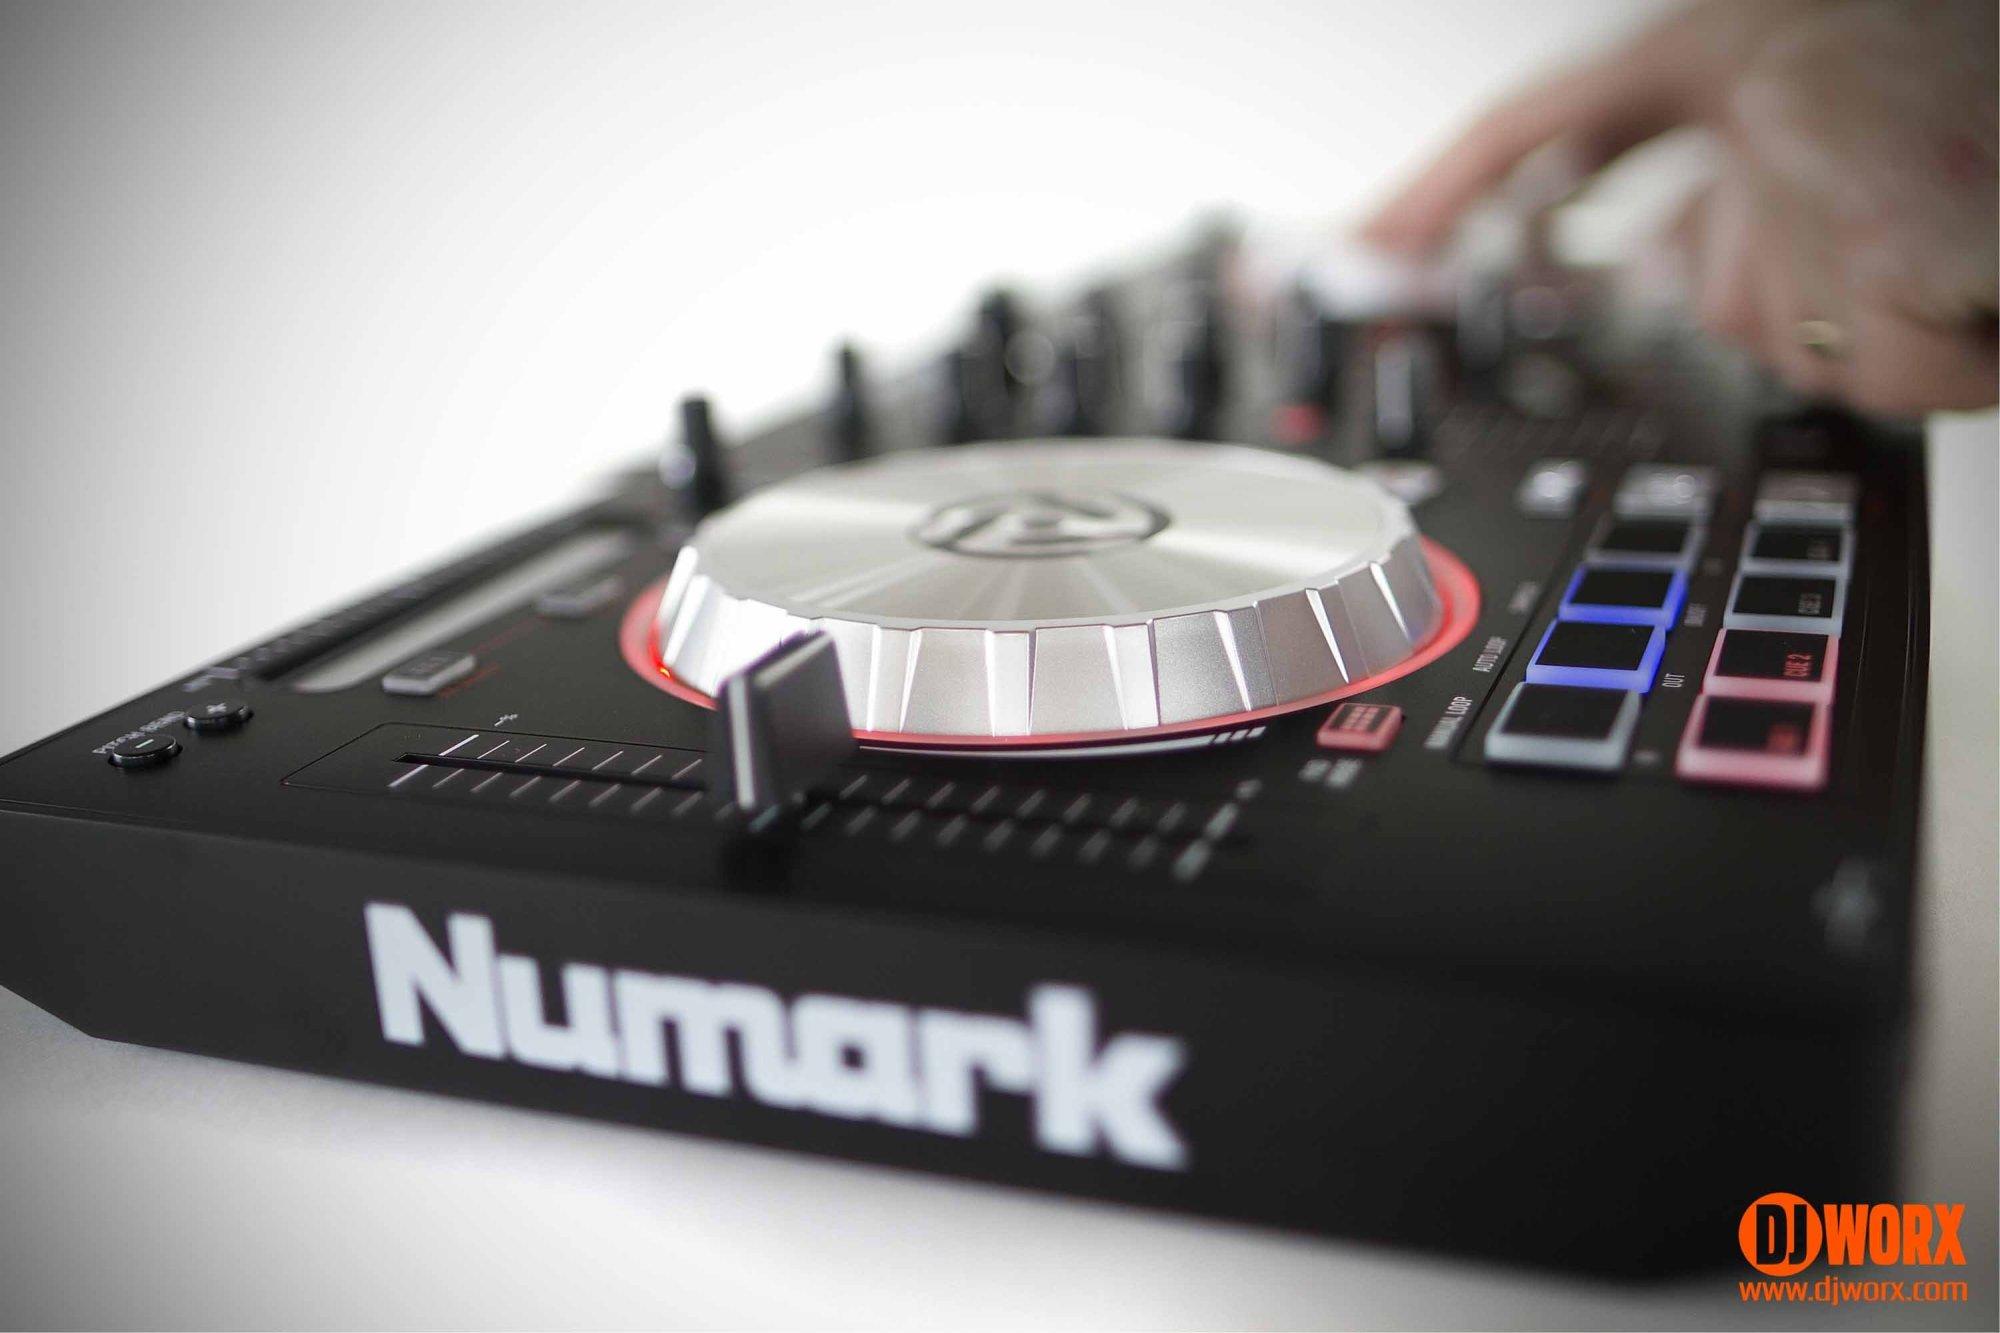 hight resolution of numark mixtrack pro 3 serato dj intro controller review 2